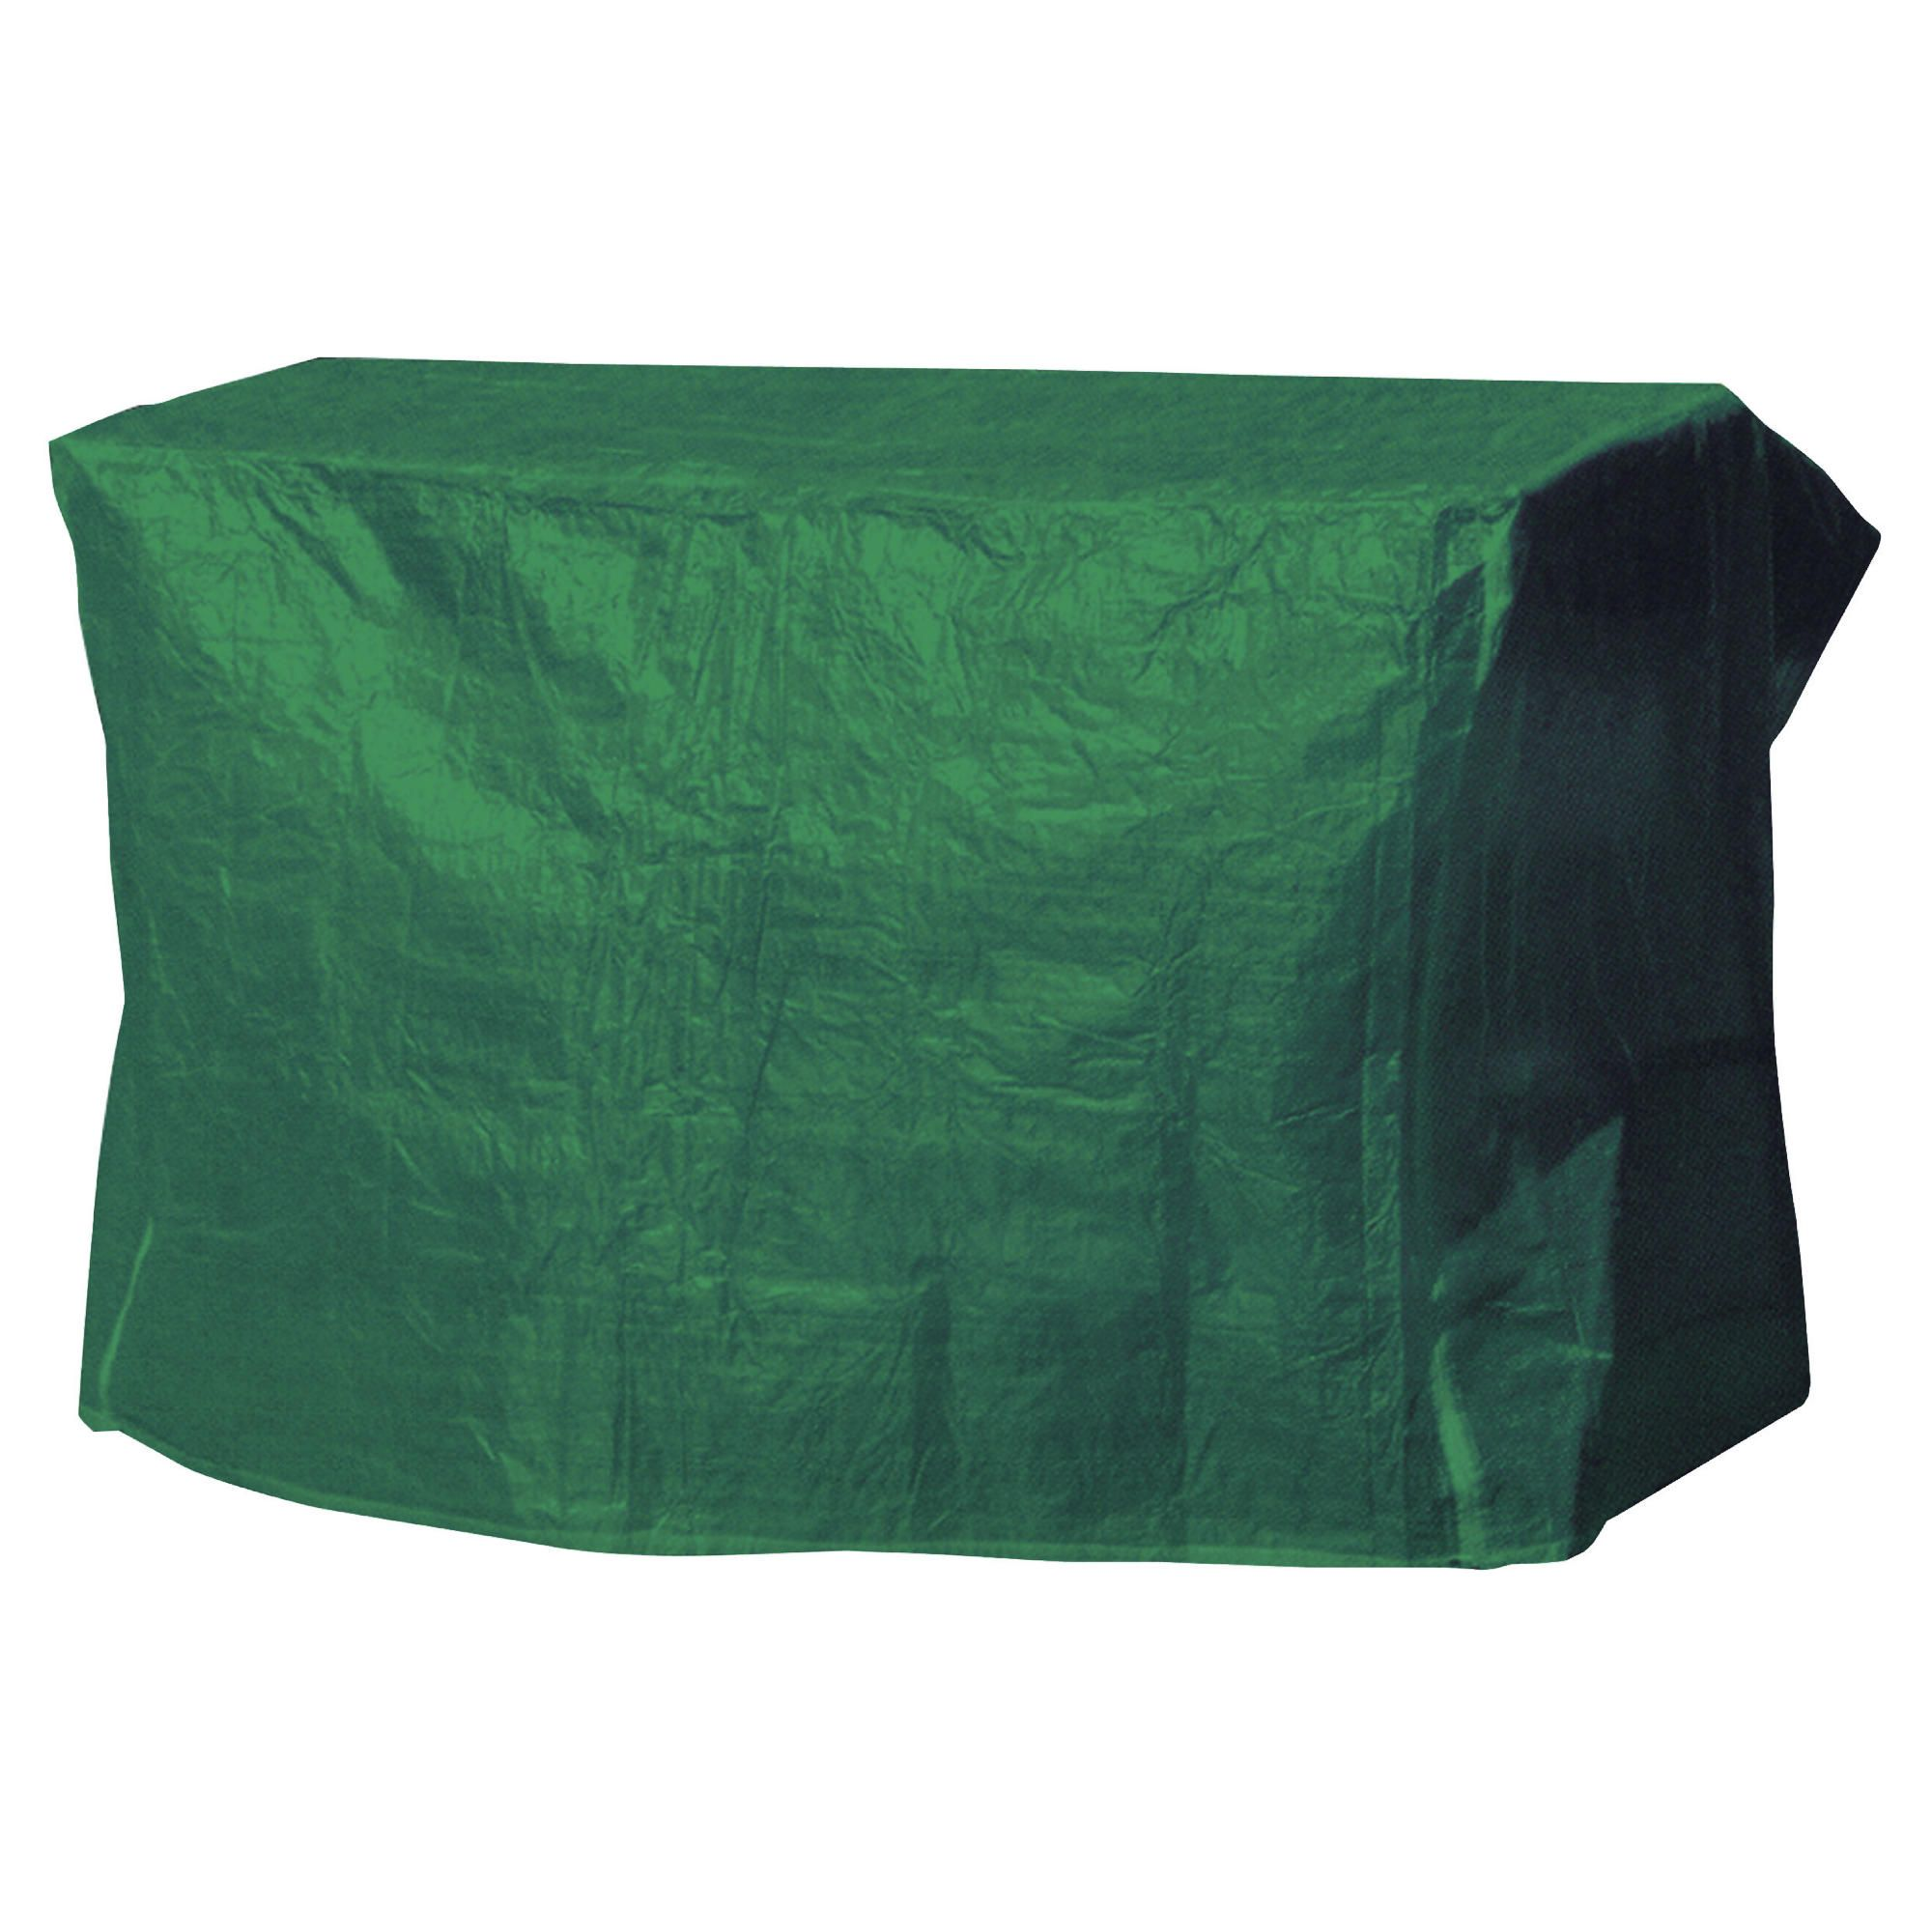 Garden Furniture Cover Swing Bench  Green. Myshop